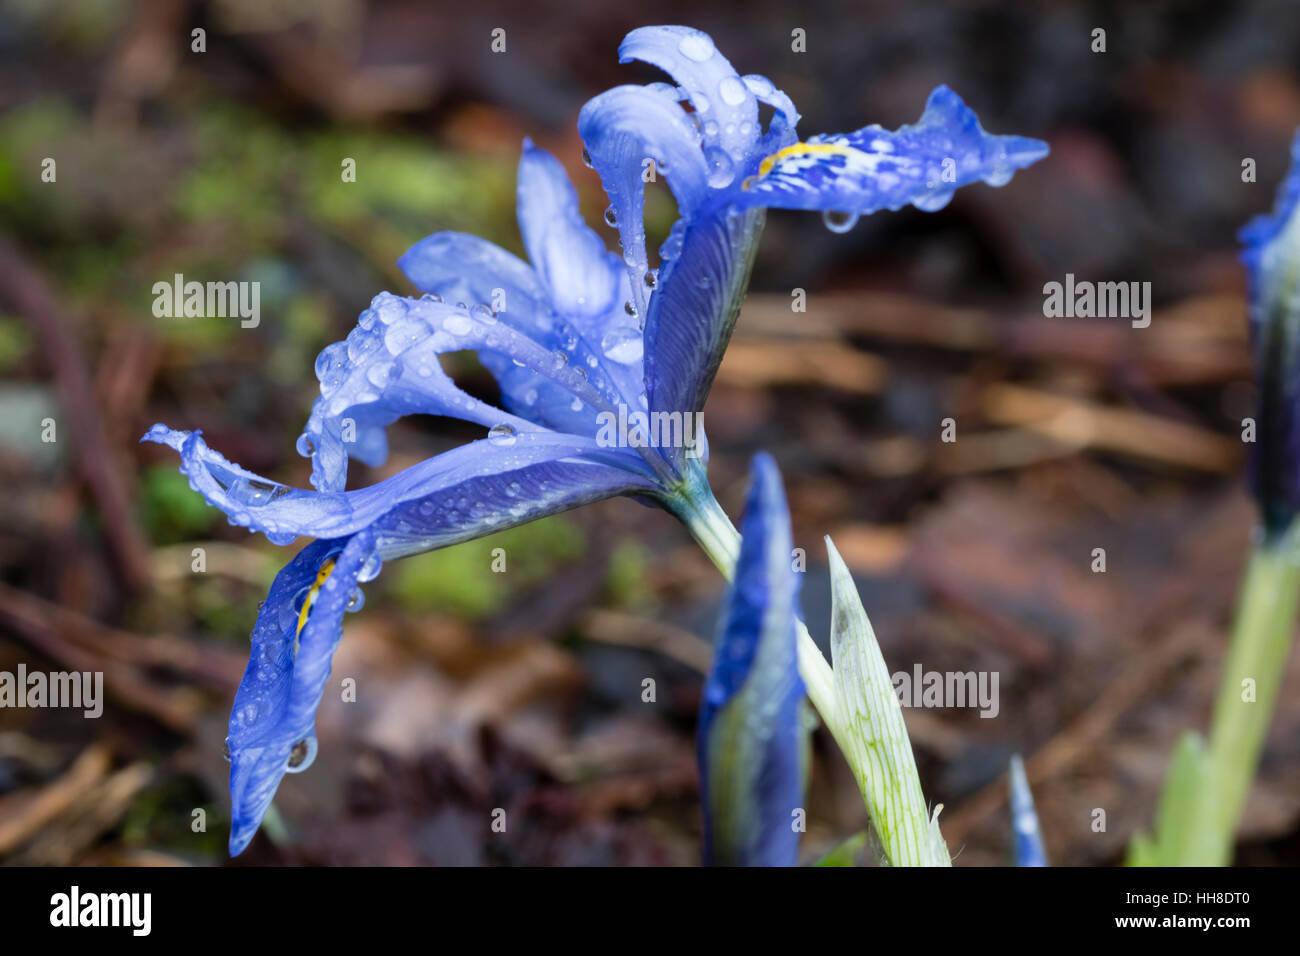 Single blue winter  flower of the dwarf reticulata type Iris, Iris histrioides 'Angel's Tears' - Stock Image